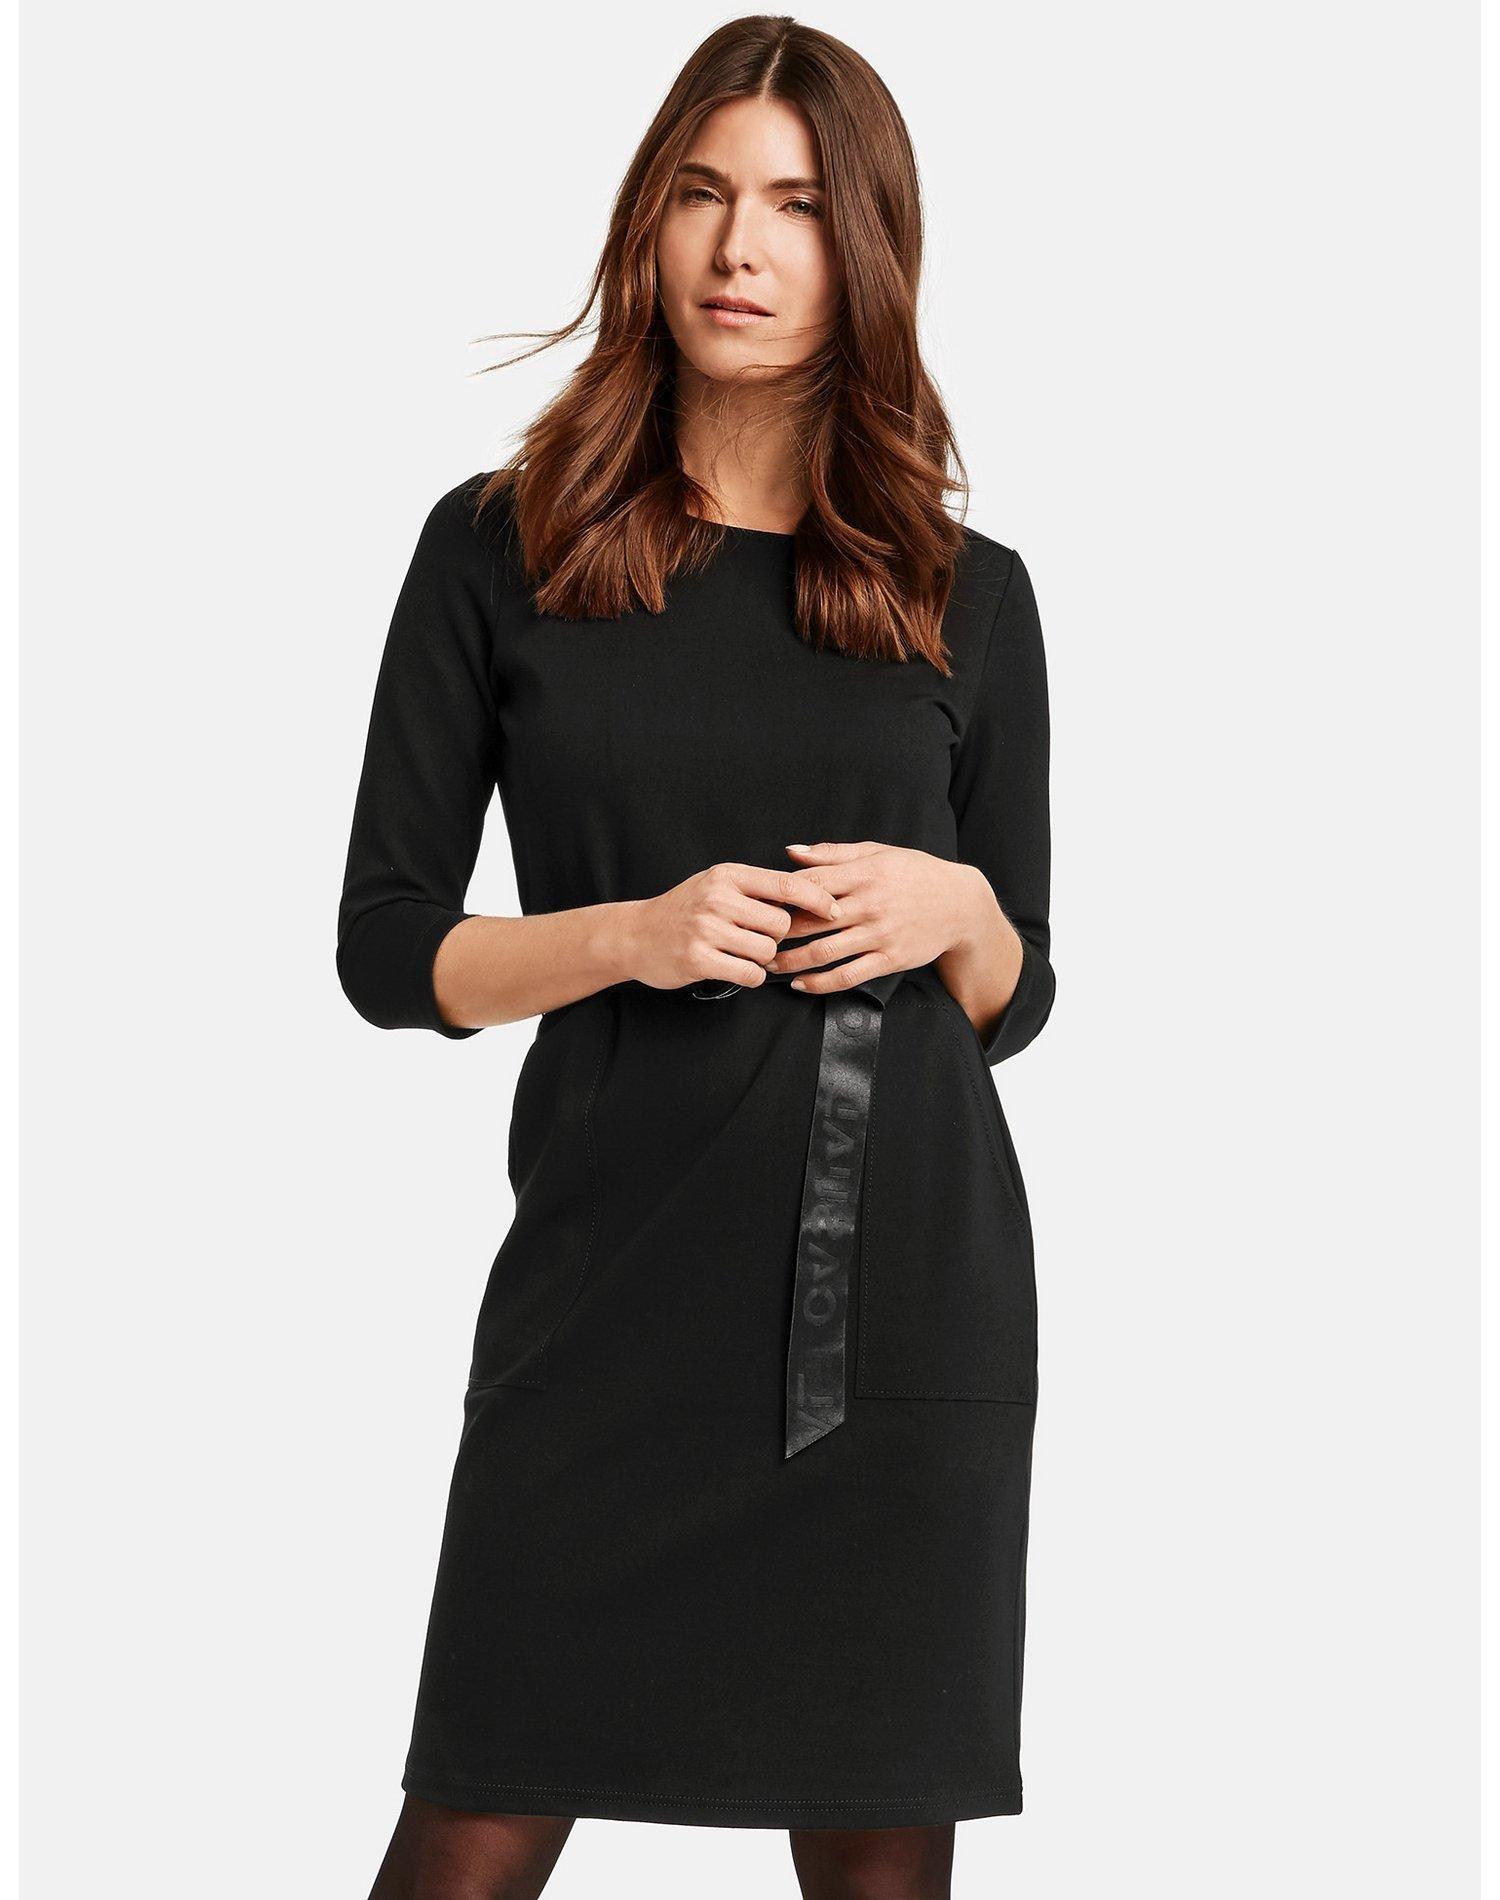 kleid gewirke jerseykleid gürtel das kleid 3/4 langem arm